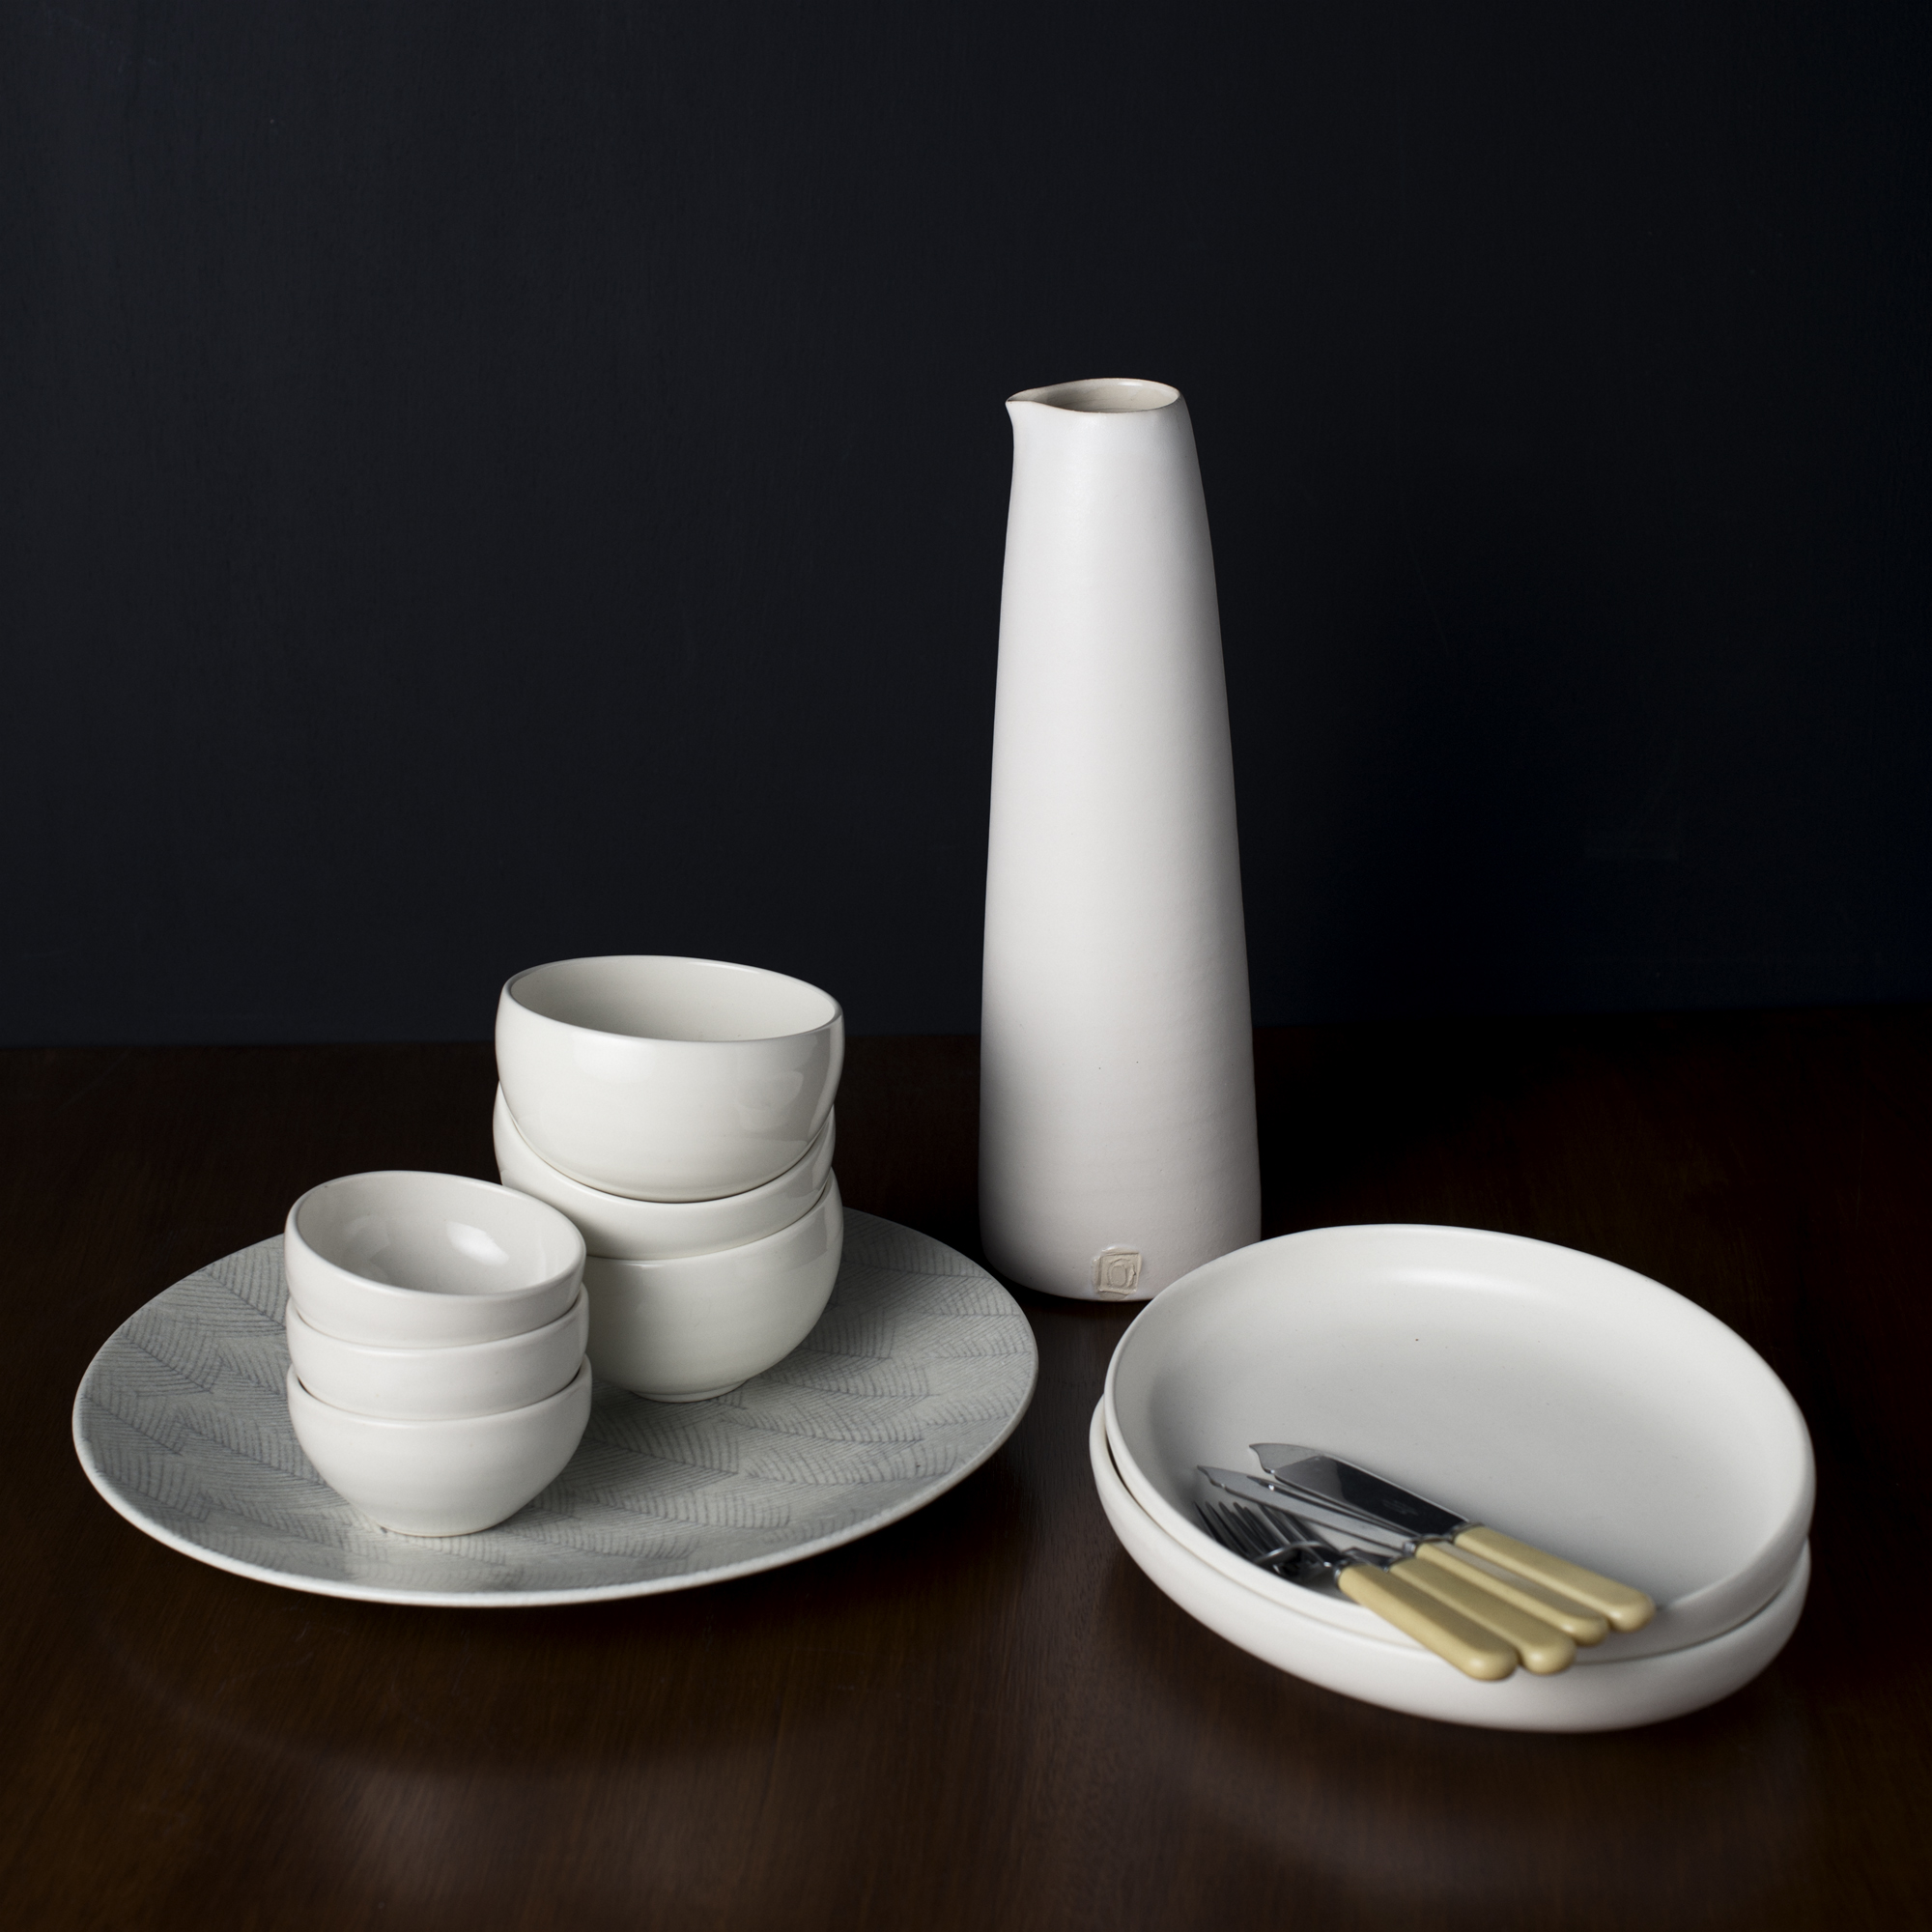 vase & crockery_bleach_bypass30s.jpg